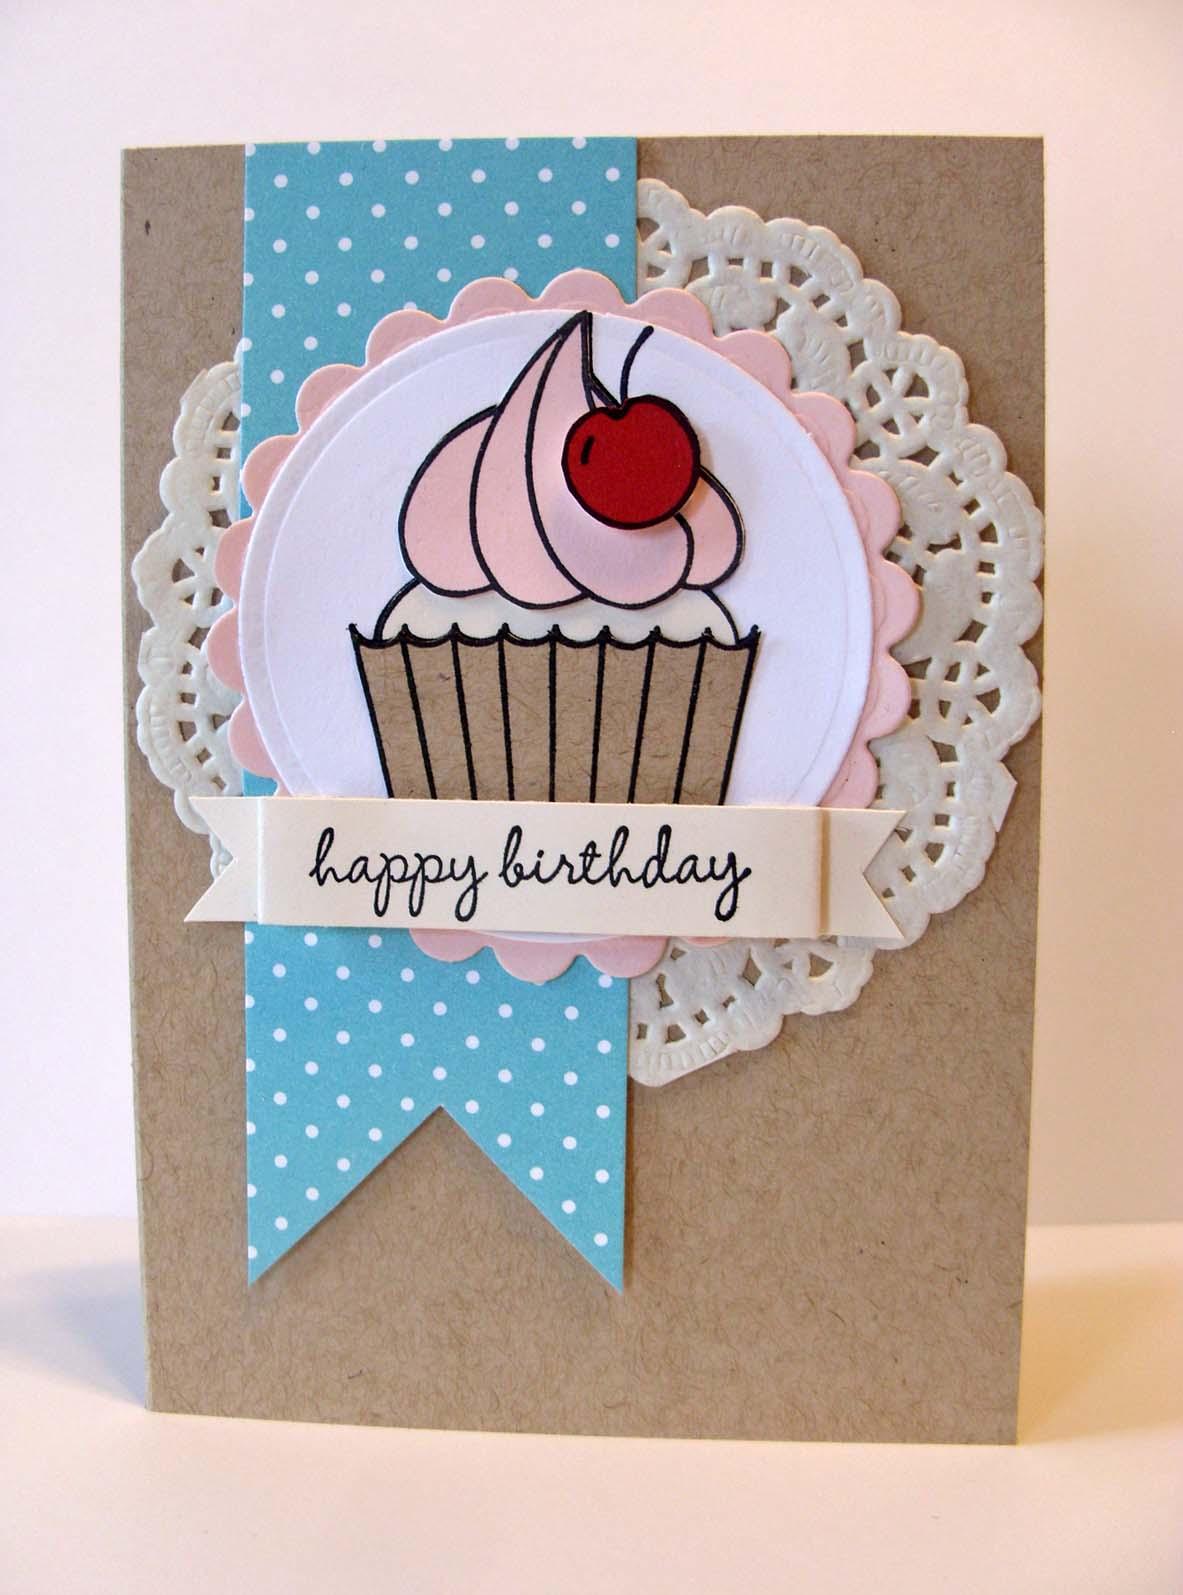 stepstep tutorials on how to make diy birthday cards